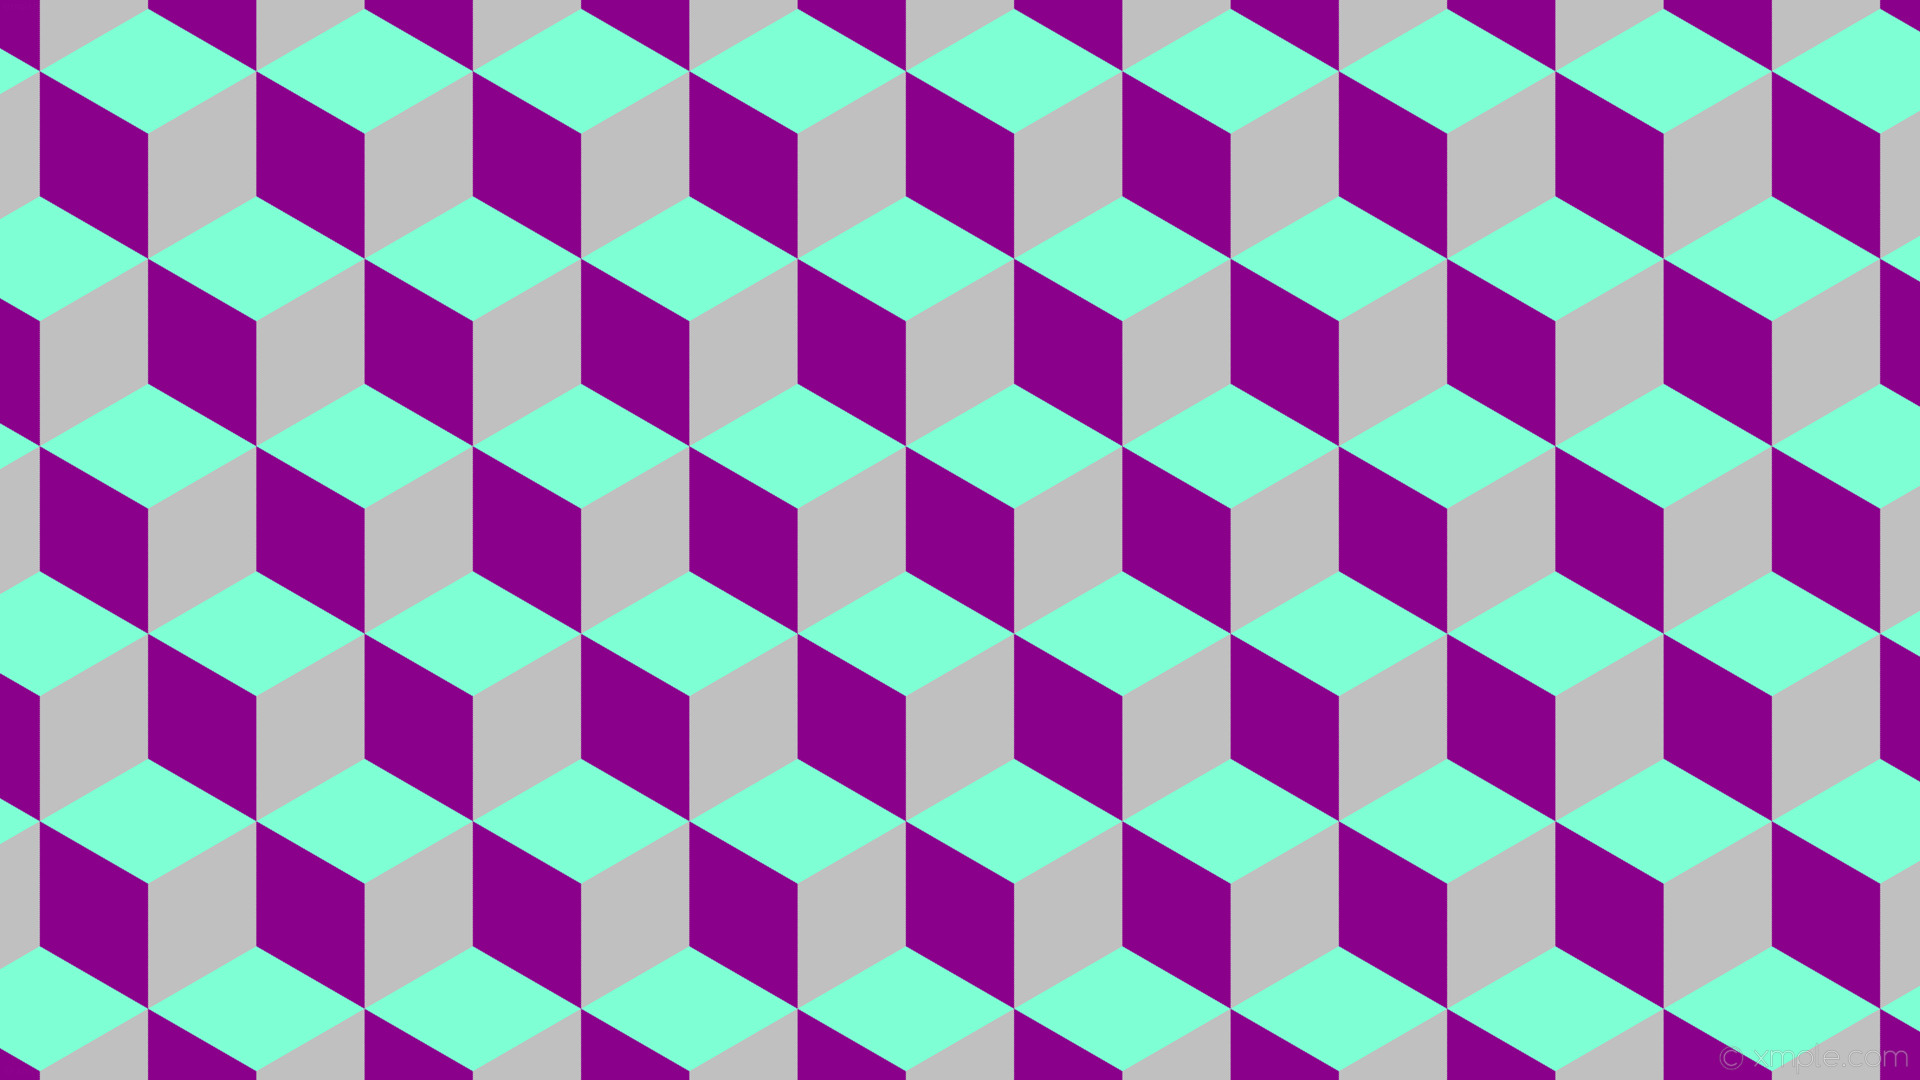 wallpaper purple grey 3d cubes blue dark magenta silver aquamarine #8b008b  #c0c0c0 #7fffd4